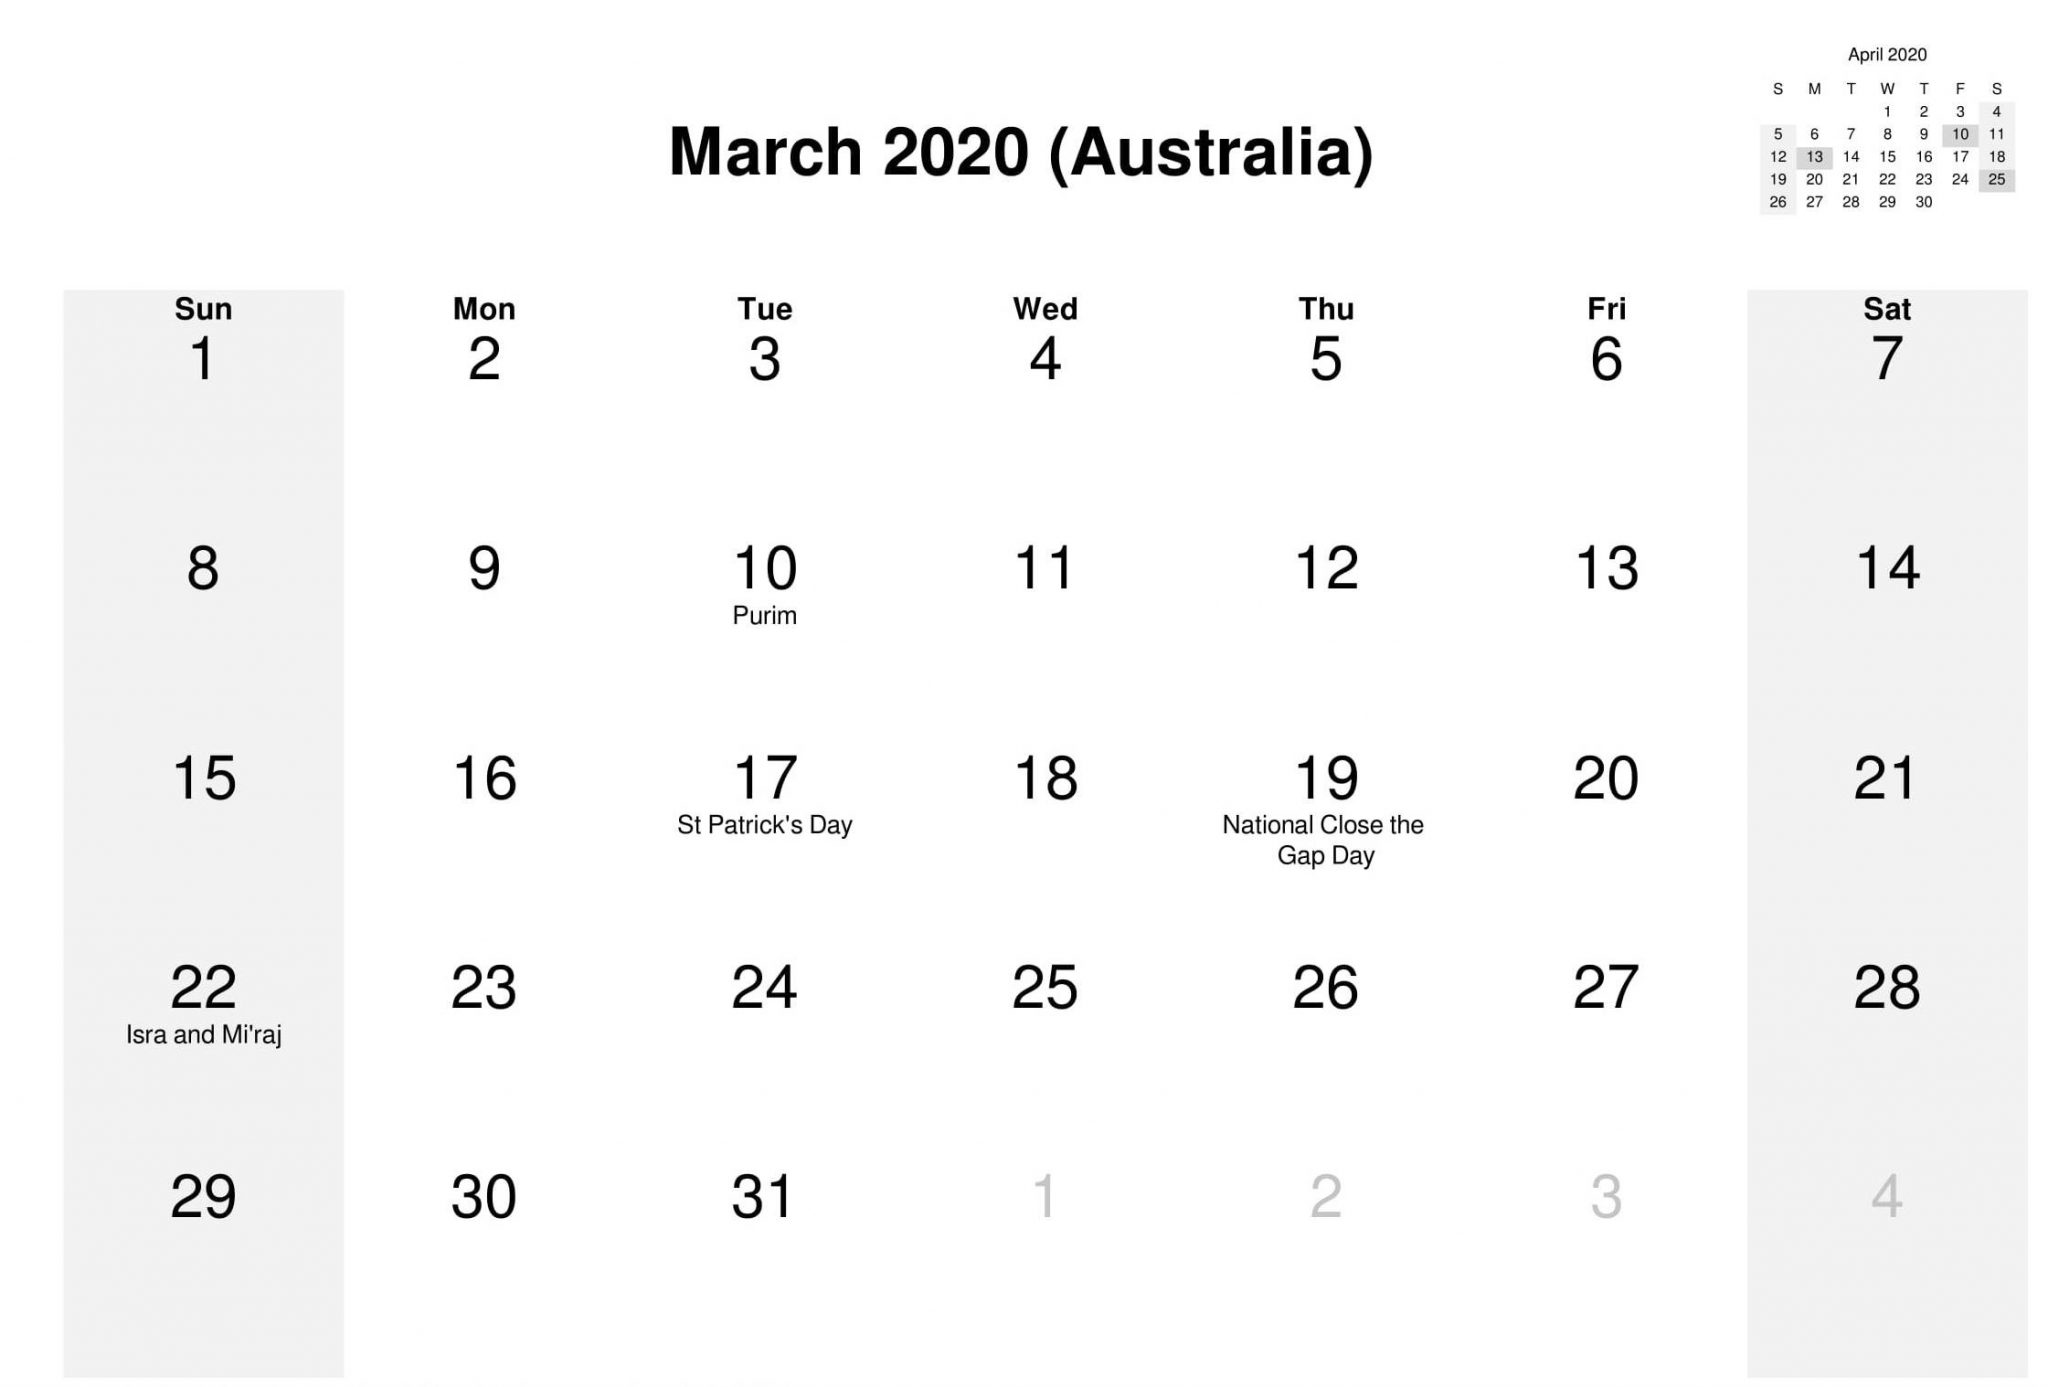 March 2020 Calendar with Australia Holidays